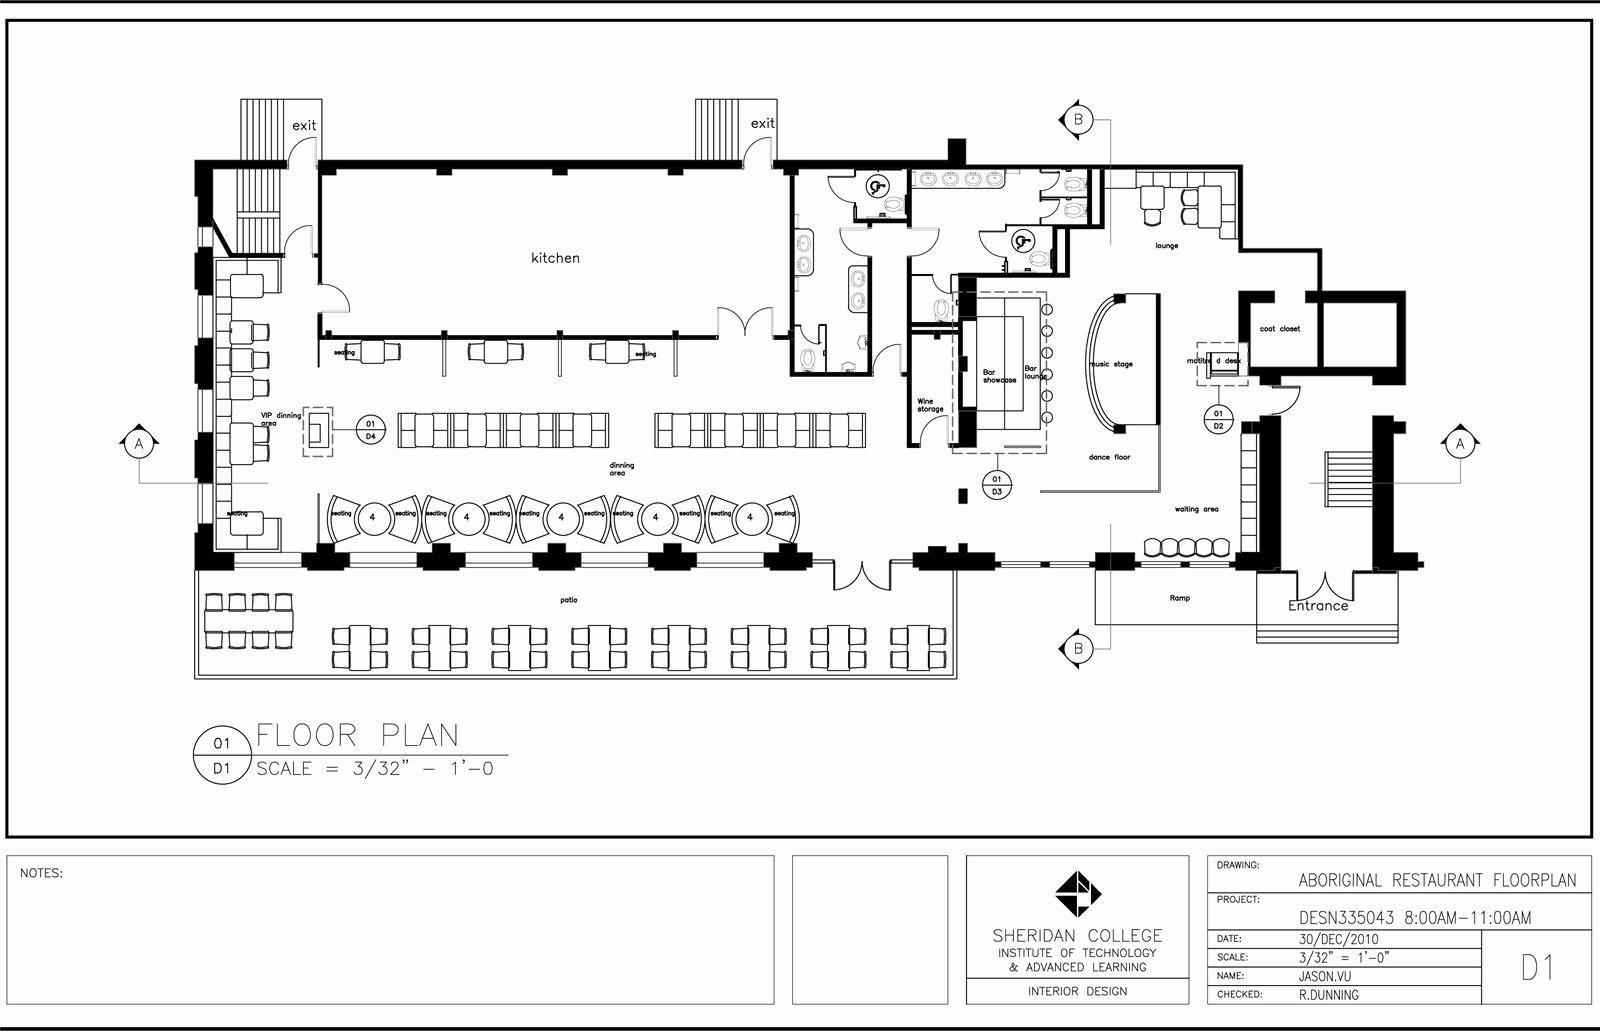 Restaurant Floor Plan Template Fresh Restaurant Floor Plans Opera House and the Great Outdoors